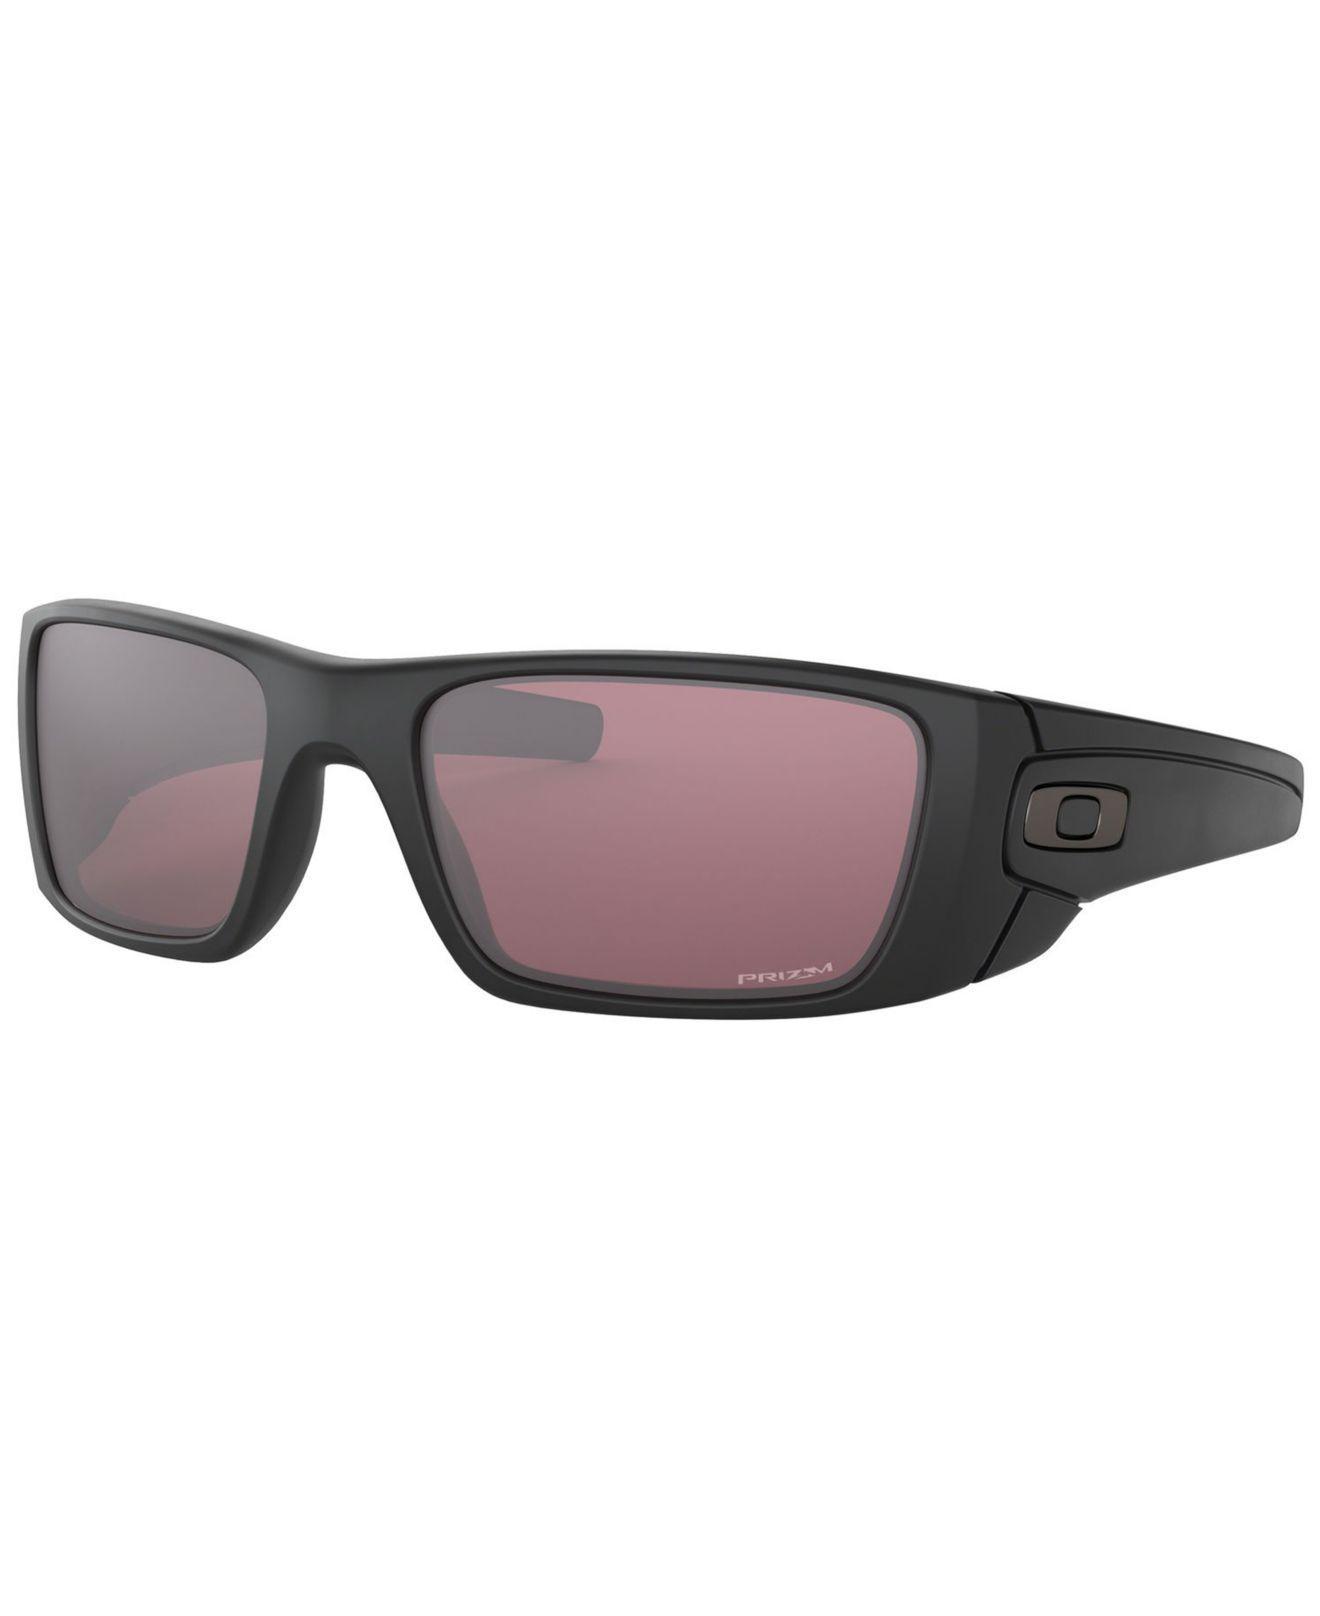 e62bcab864 Oakley. Men s Black Sunglasses